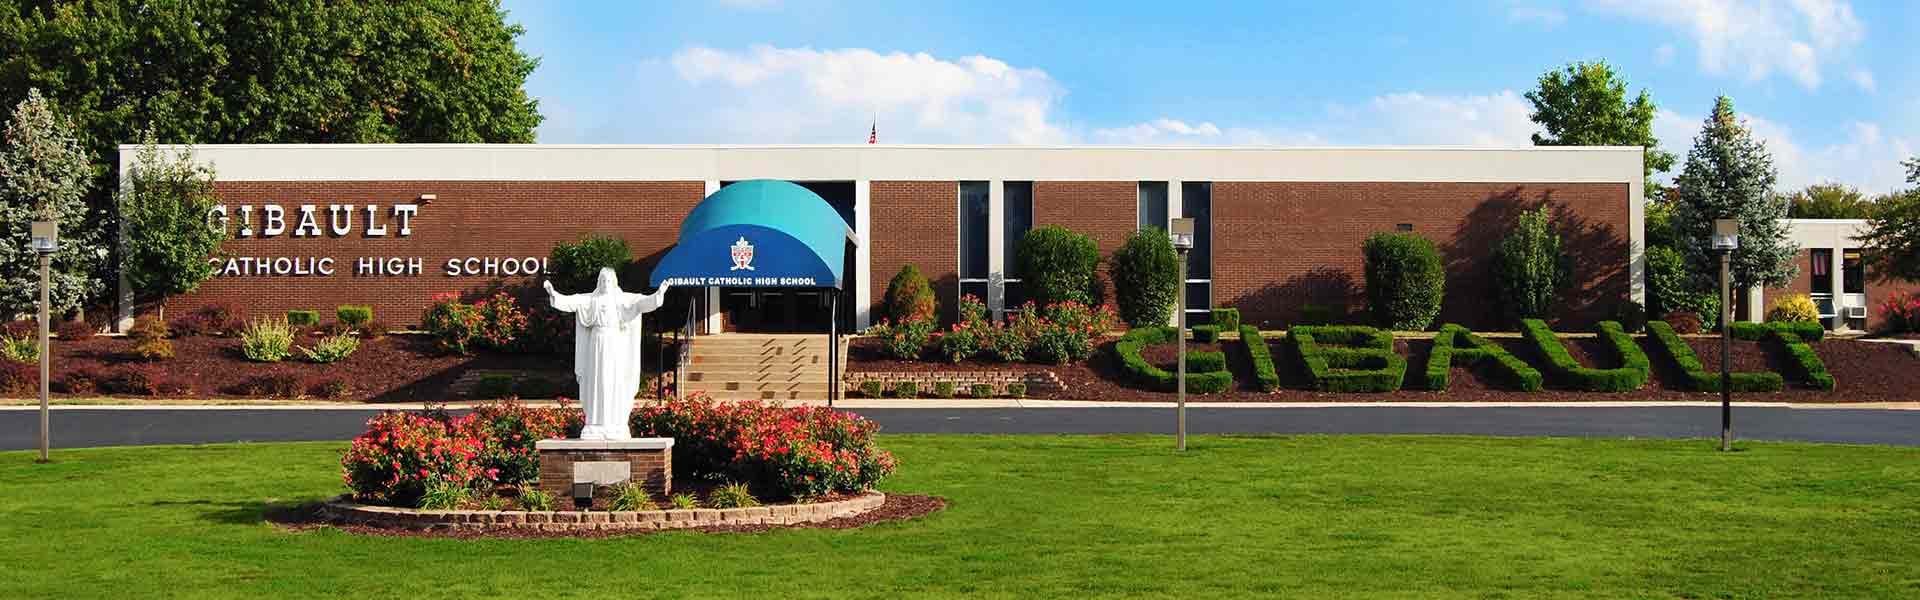 GibaultCatholicHighSchool-Private-IL-School-Building-Banner-2021